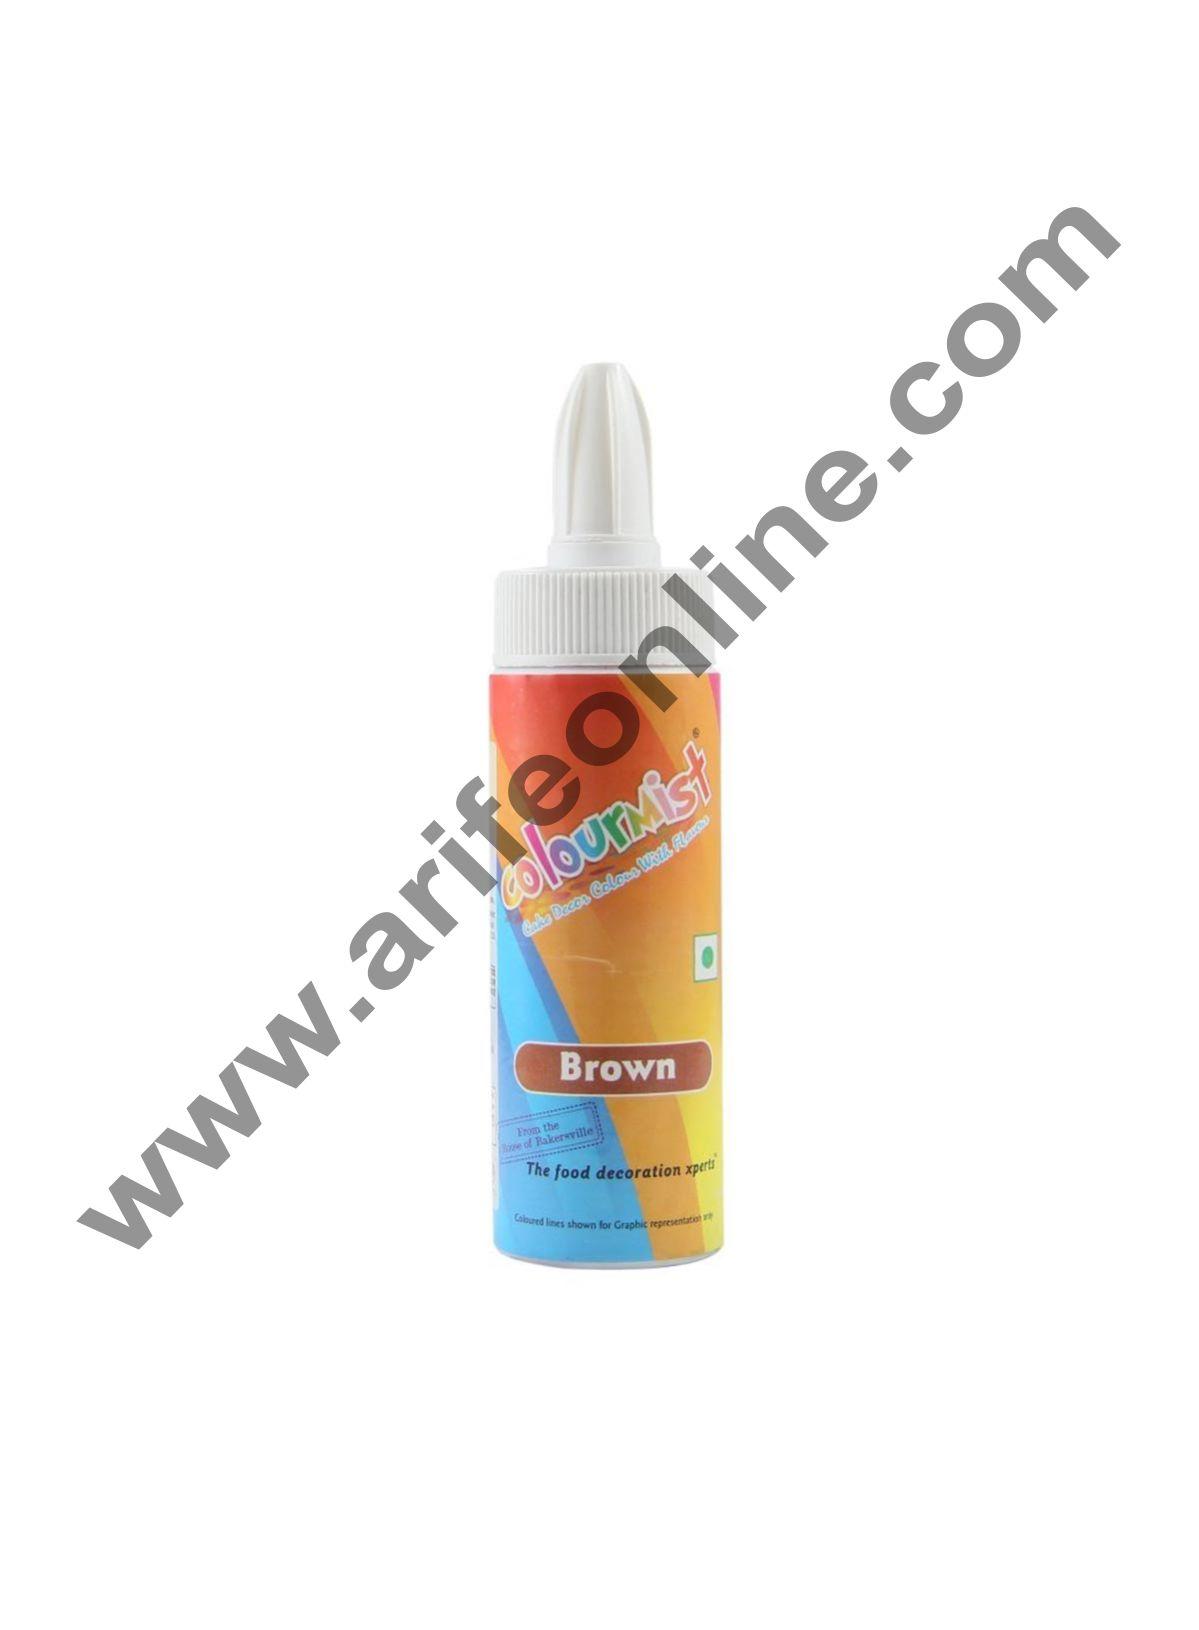 Colourmist Powder Spray (Brown), 60gm